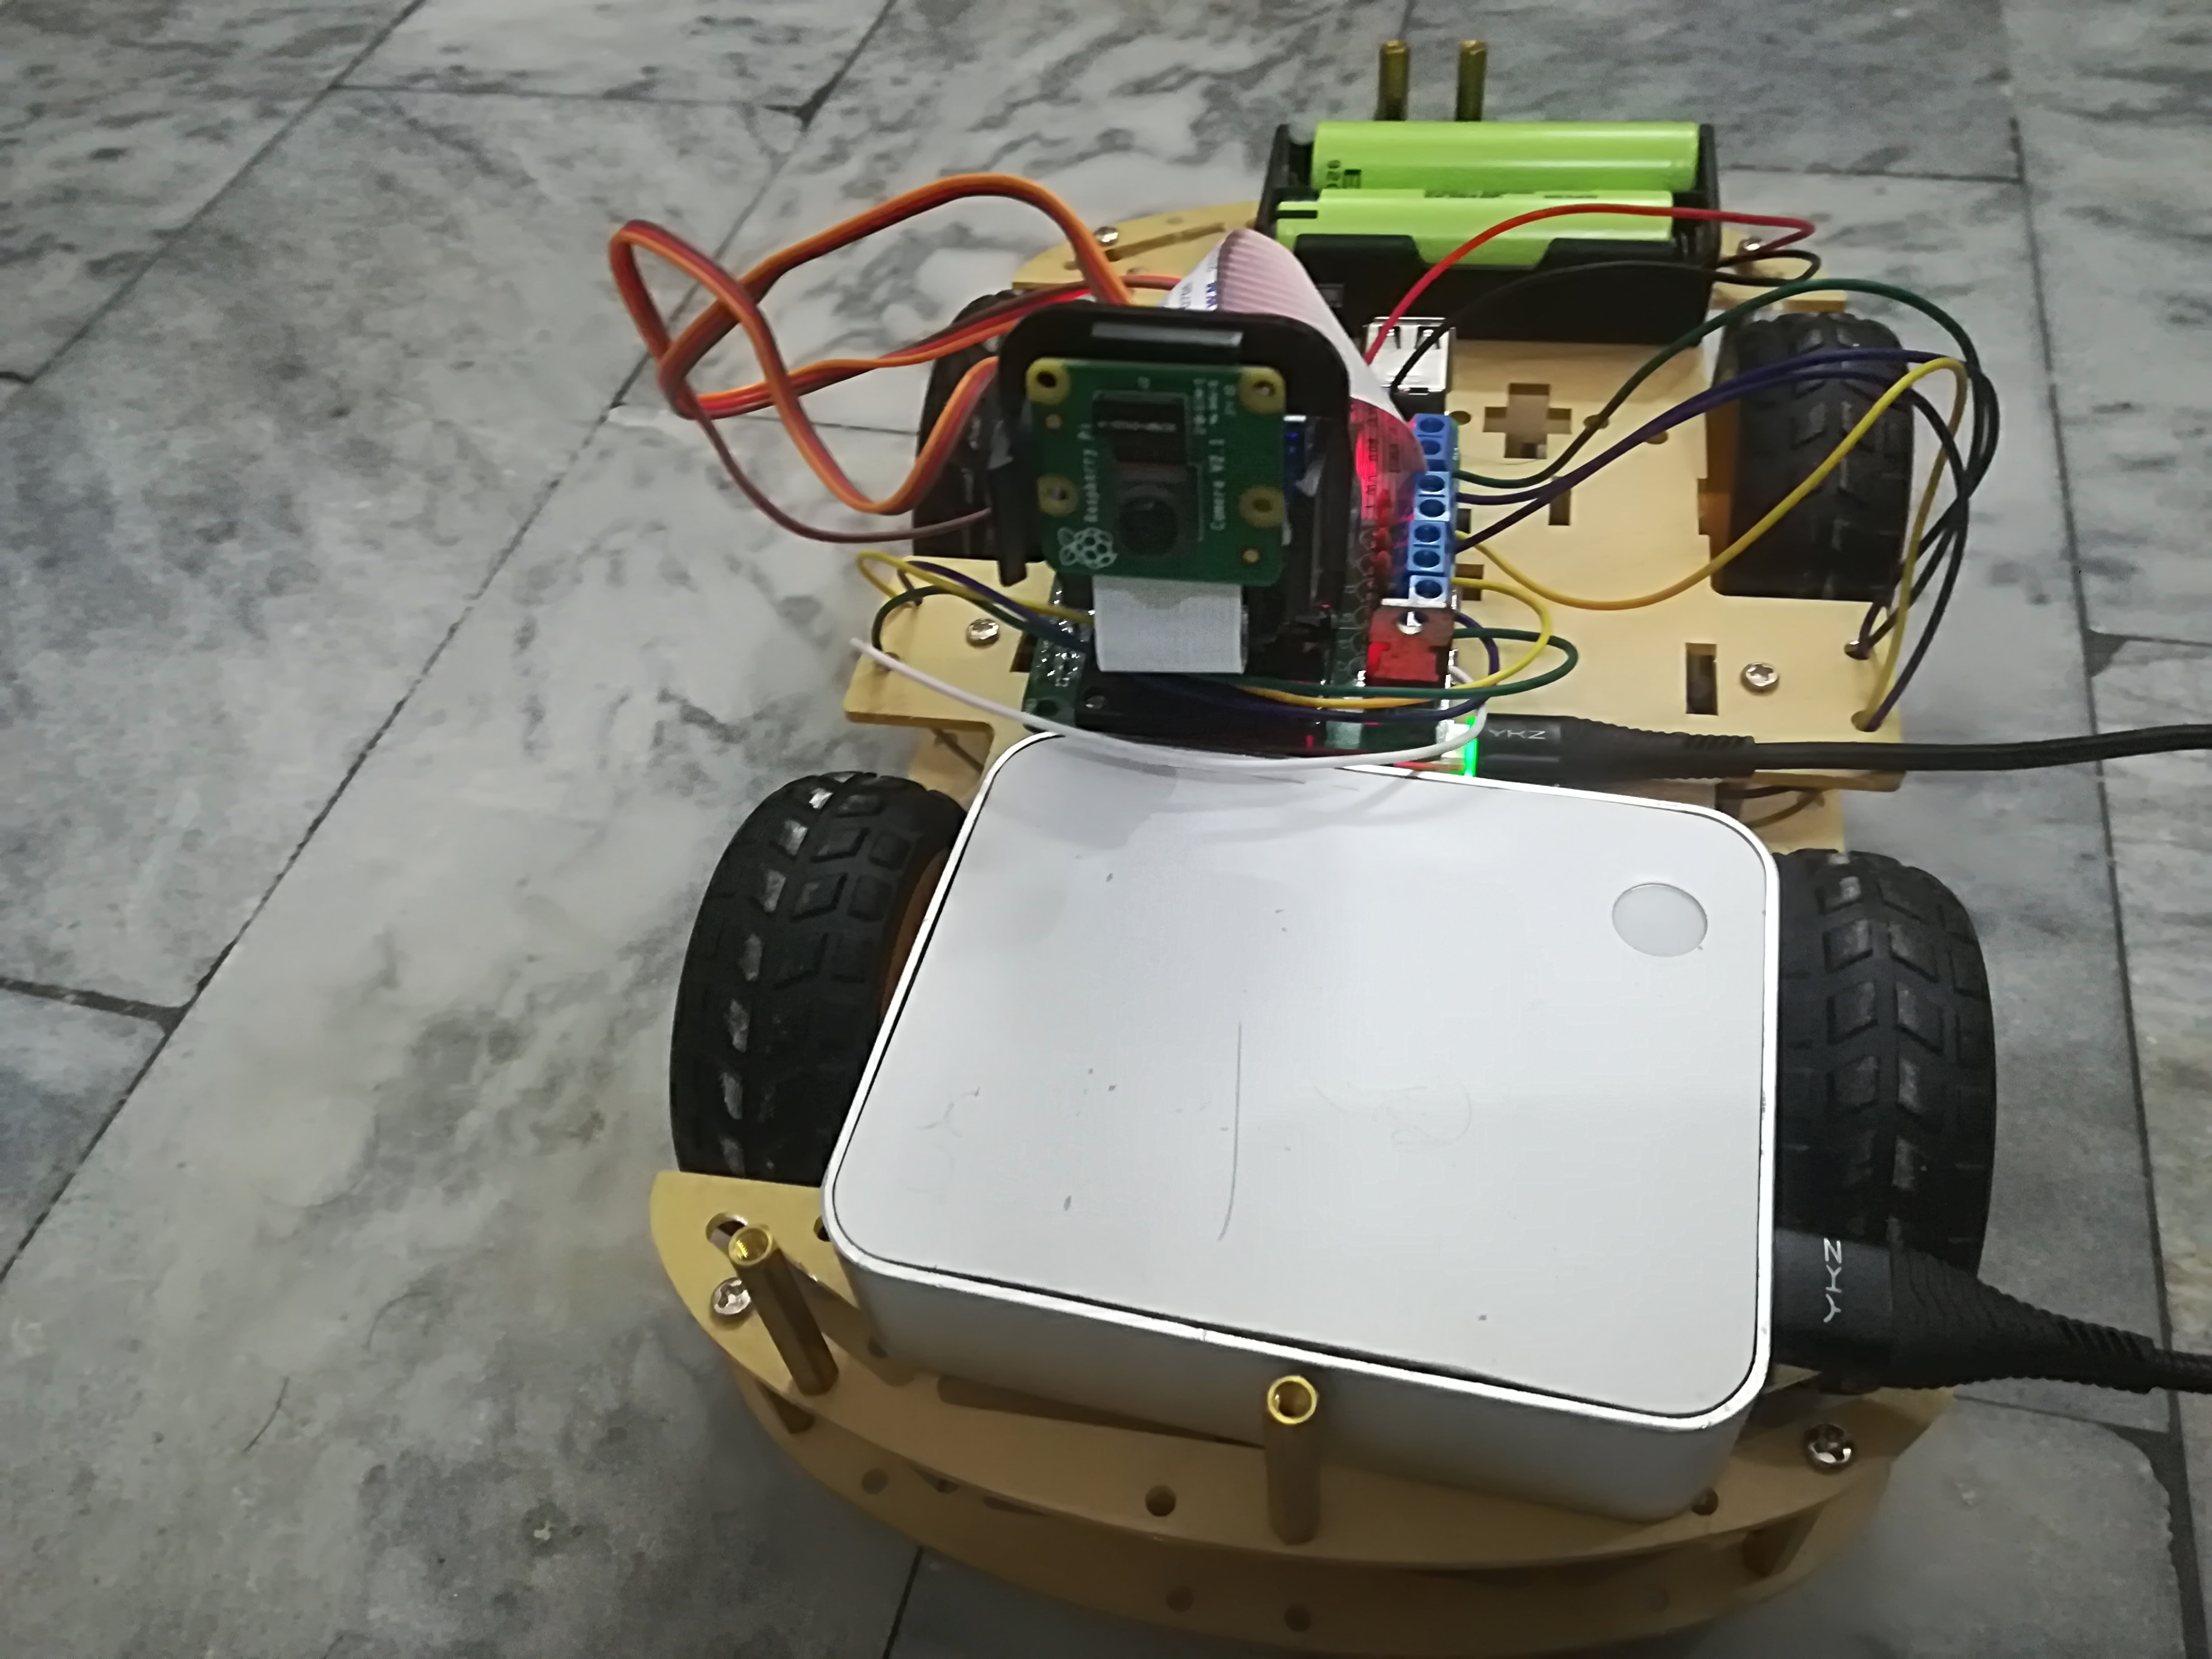 Wireless Video Surveillance Robot using Raspberry Pi 3.jpg